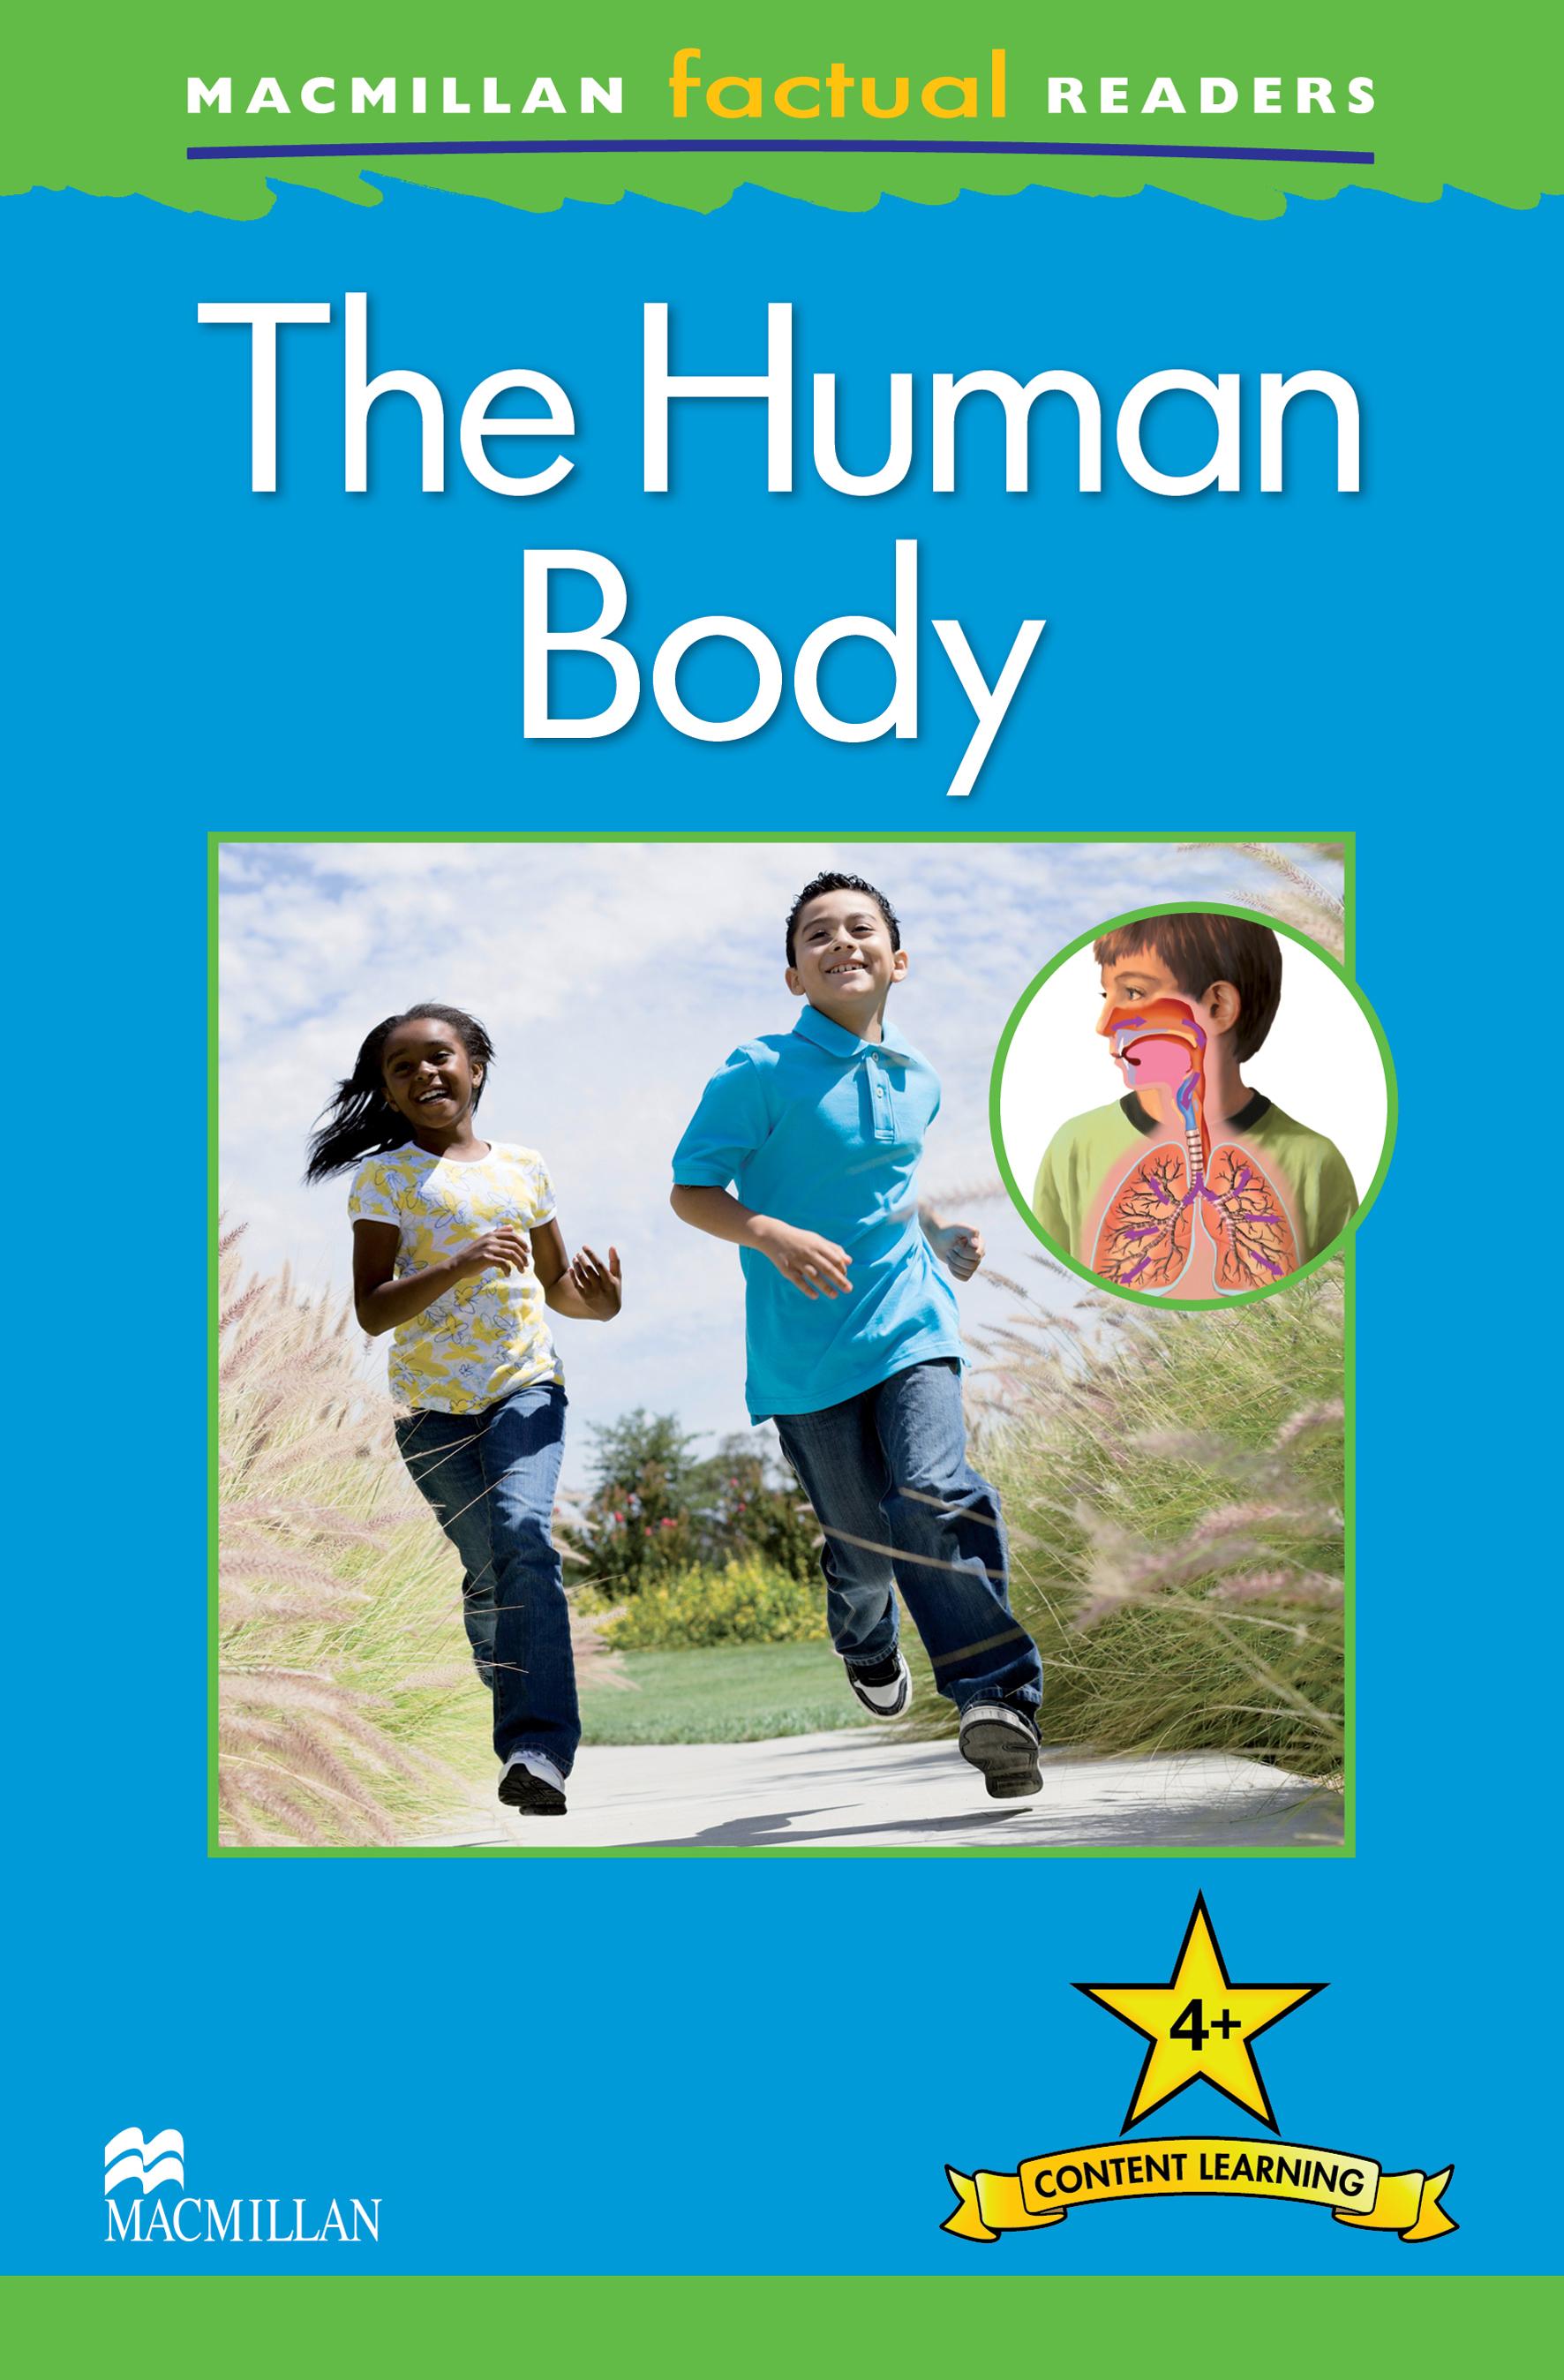 Macmillan Factual Readers: The Human Body